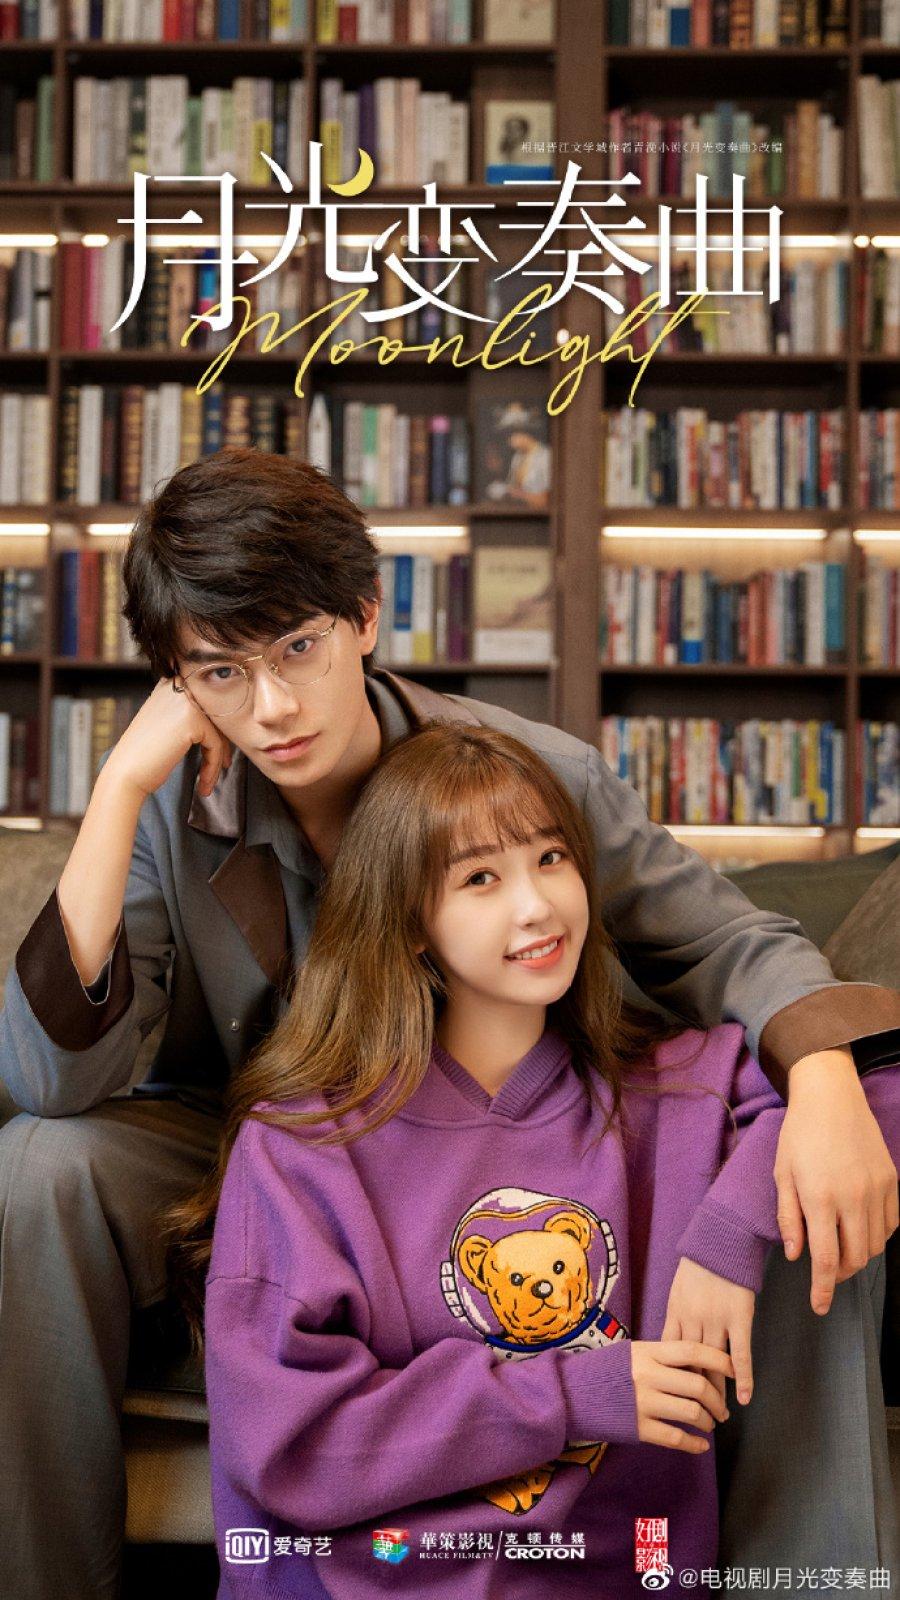 Upcoming Mainland Chinese Drama 2021] Moonlight 月光变奏曲 - Mainland China - Soompi Forums